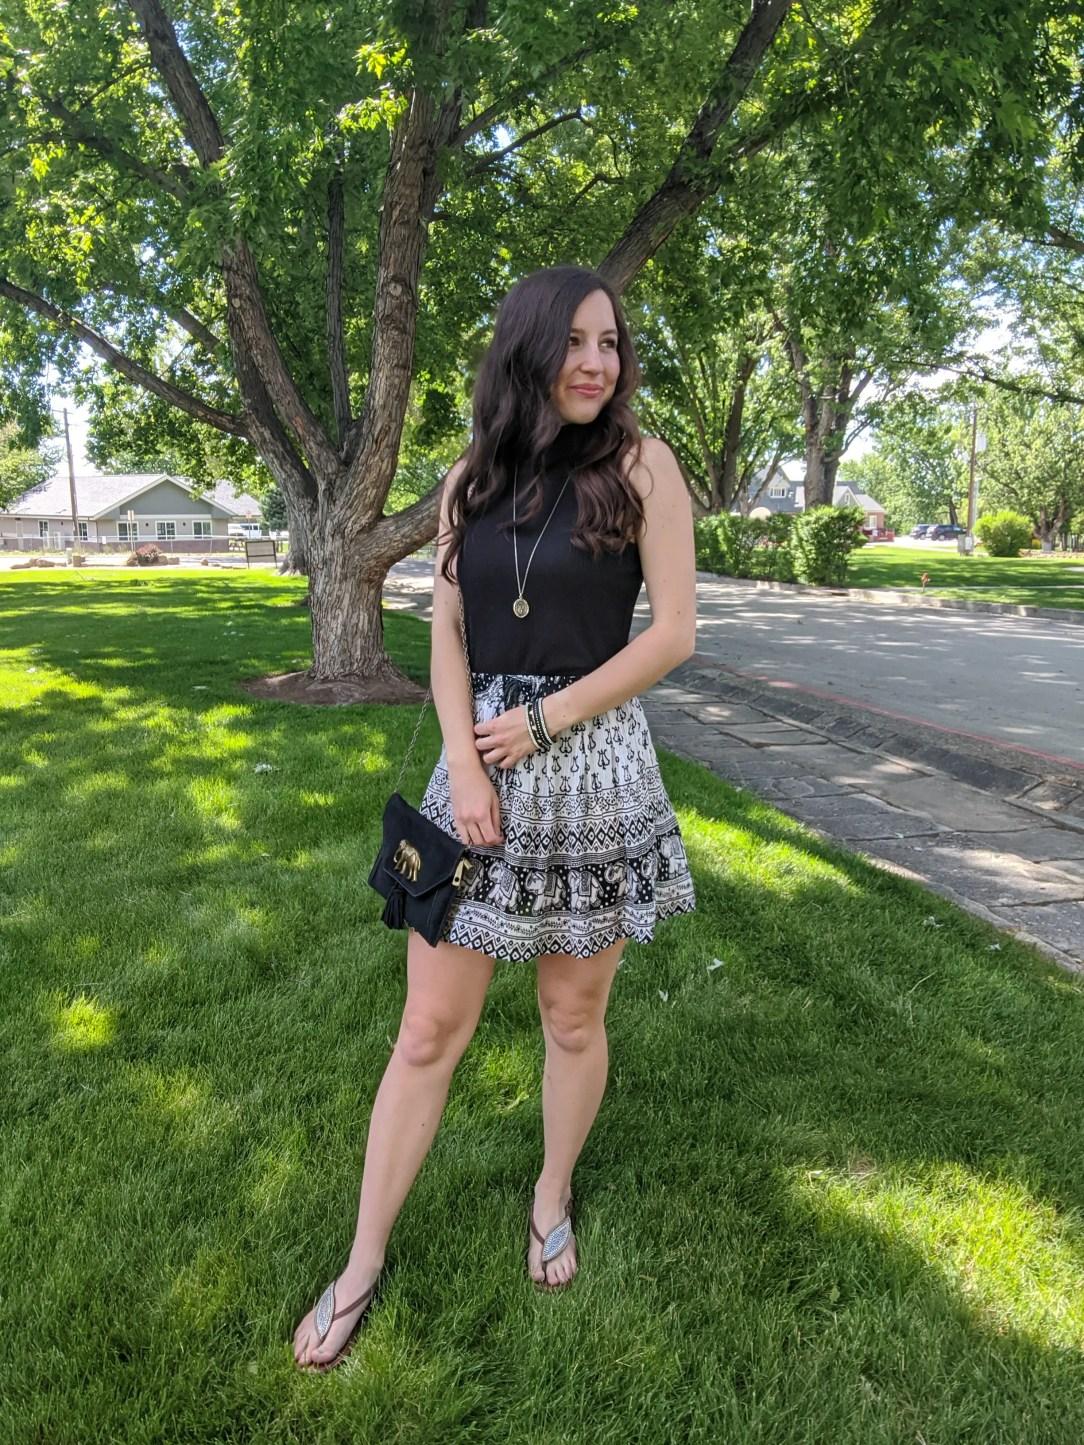 summer-outfit-boho-style-elephant-patterned-skirt